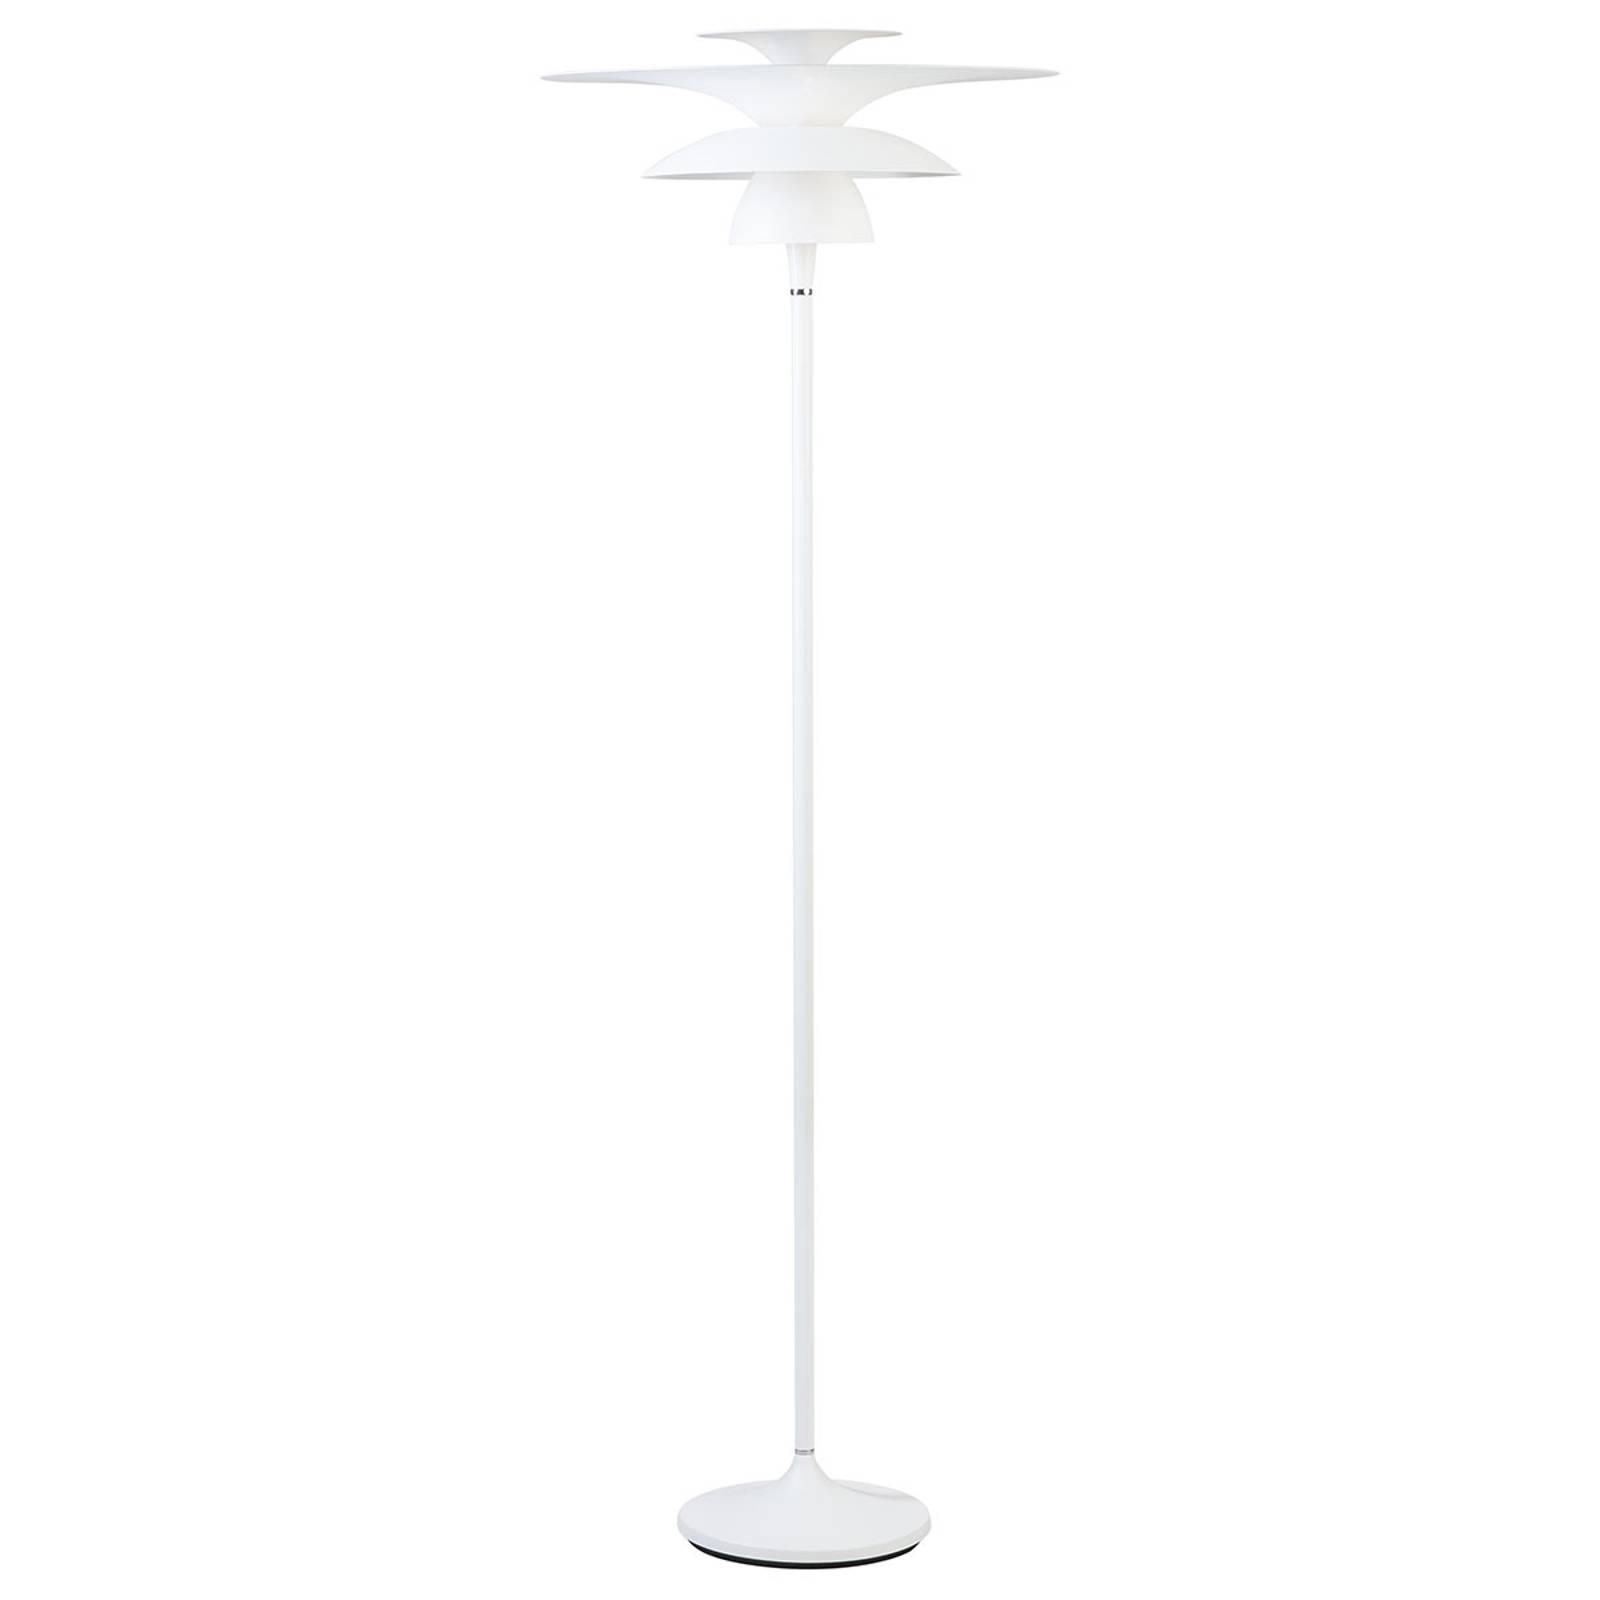 Picasso-LED-lattiavalo, varjostin 38 cm, valkoinen